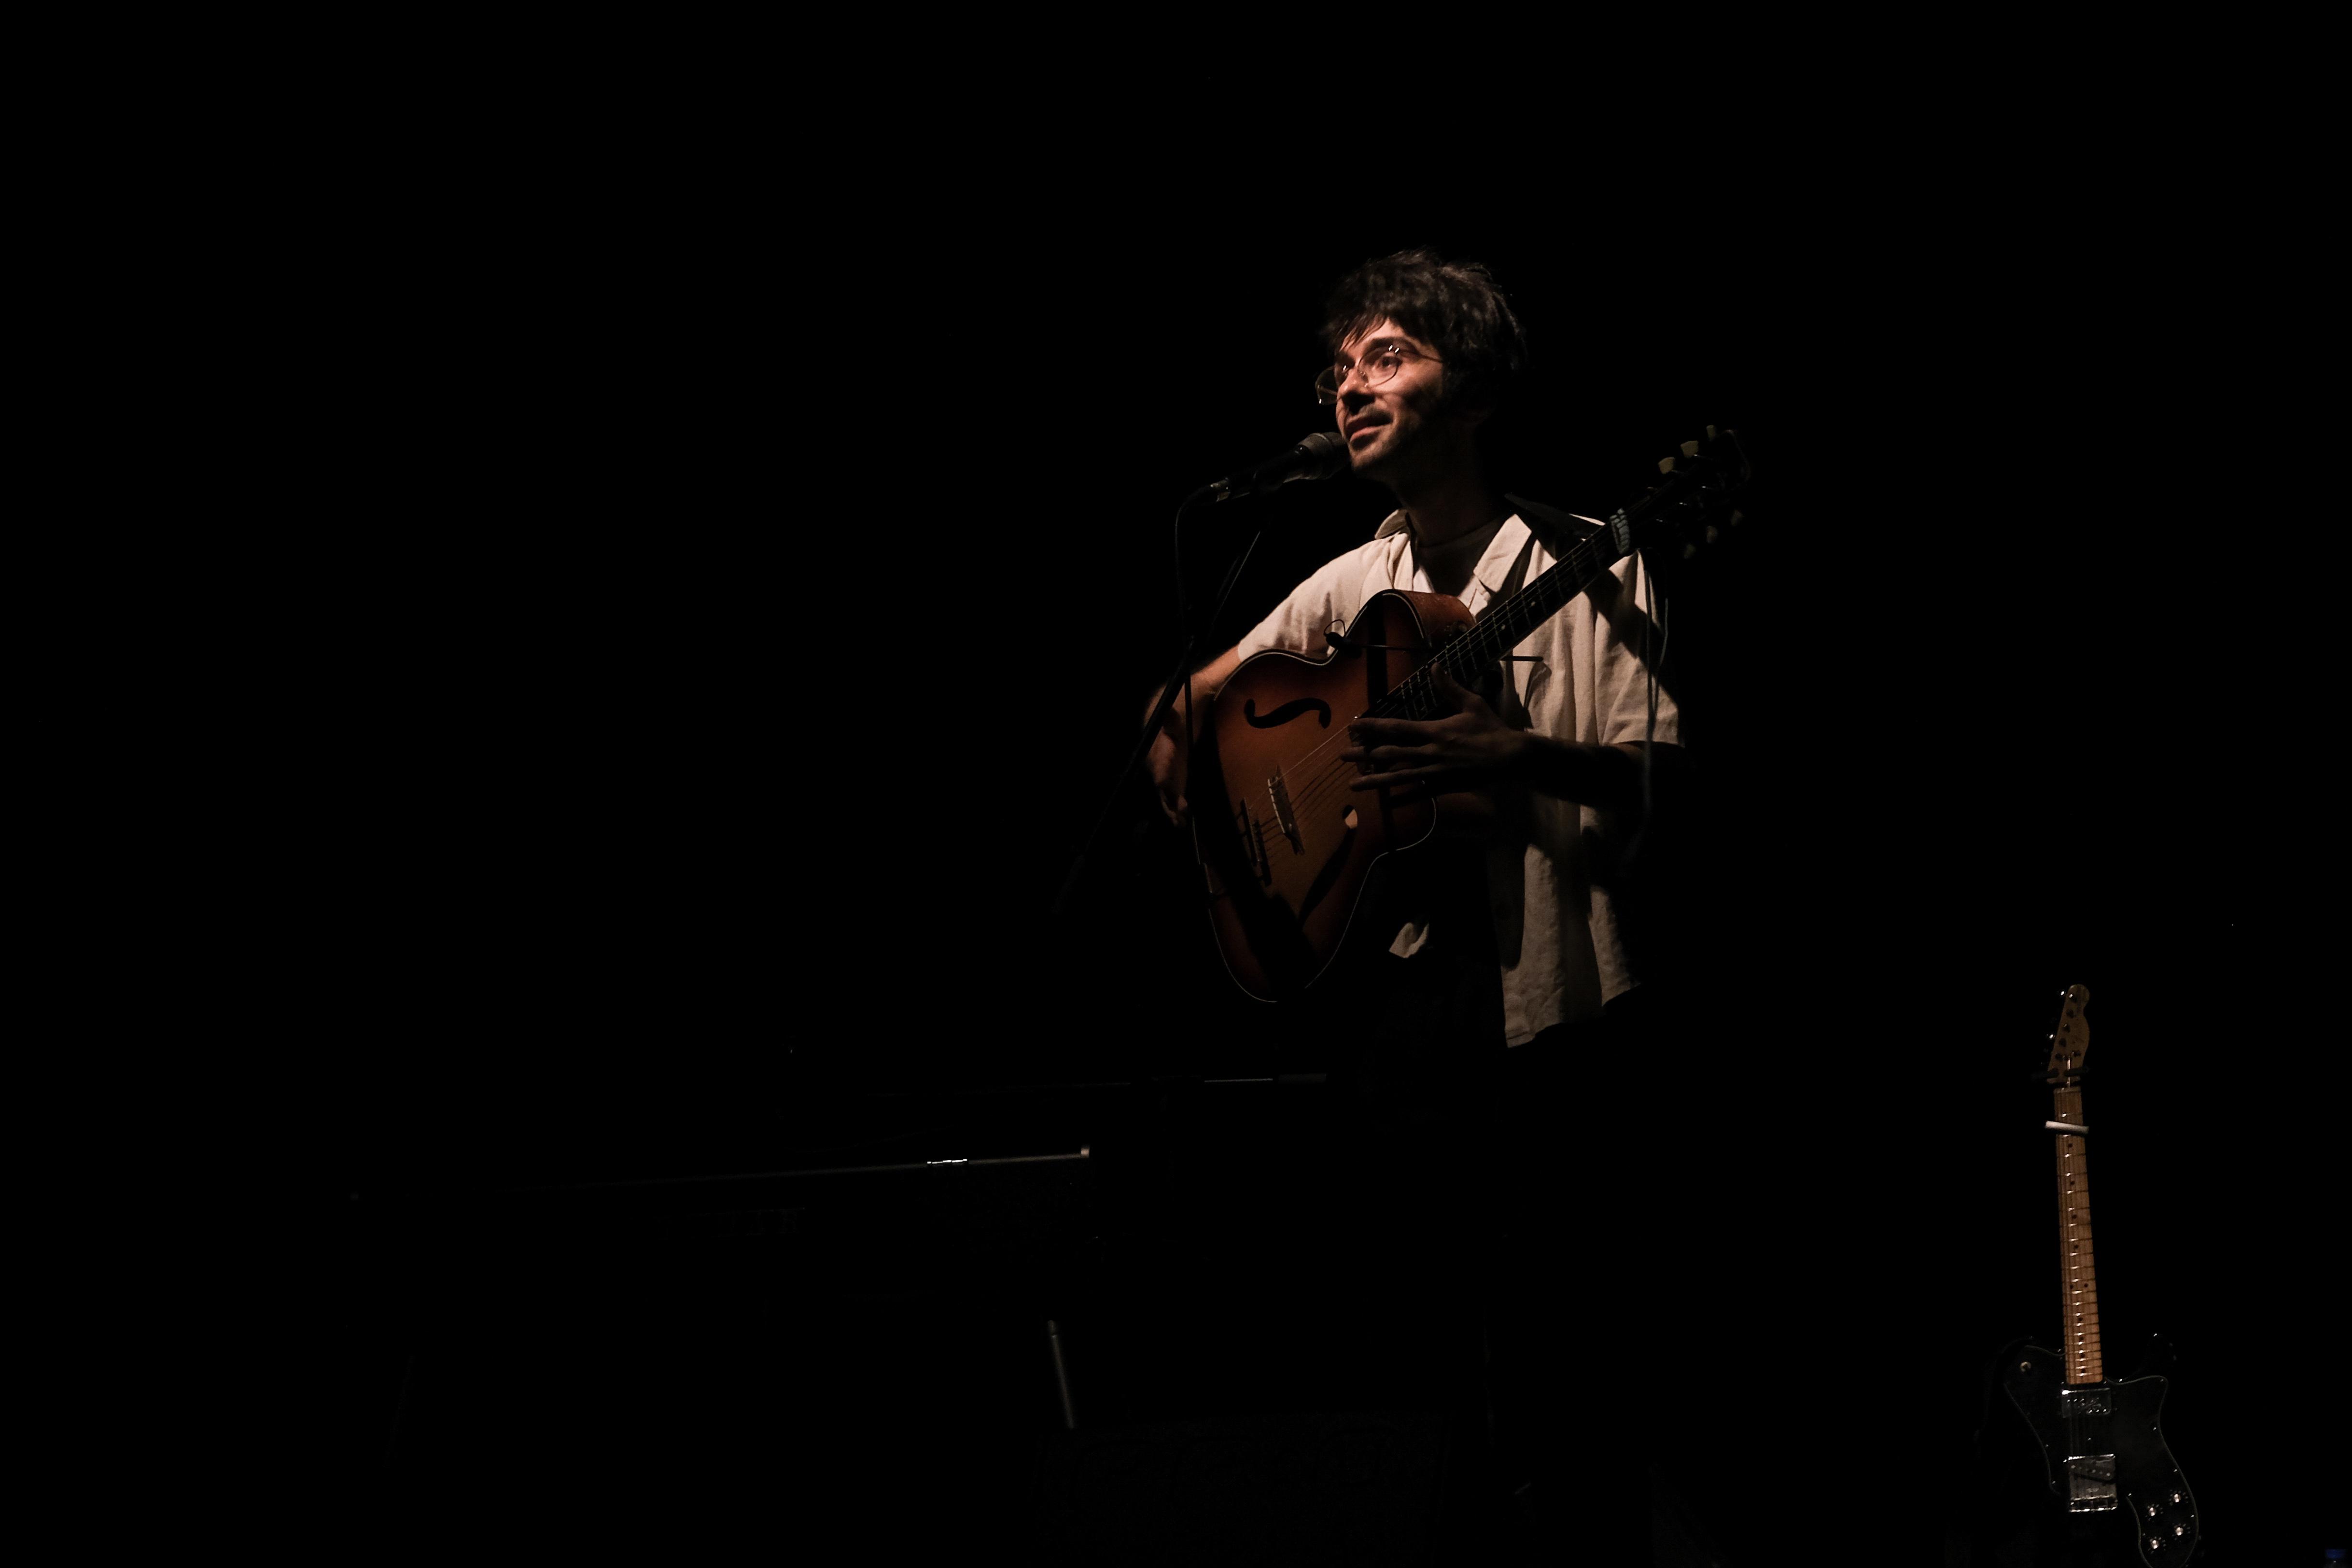 Fotografia: Mariana Cardoso